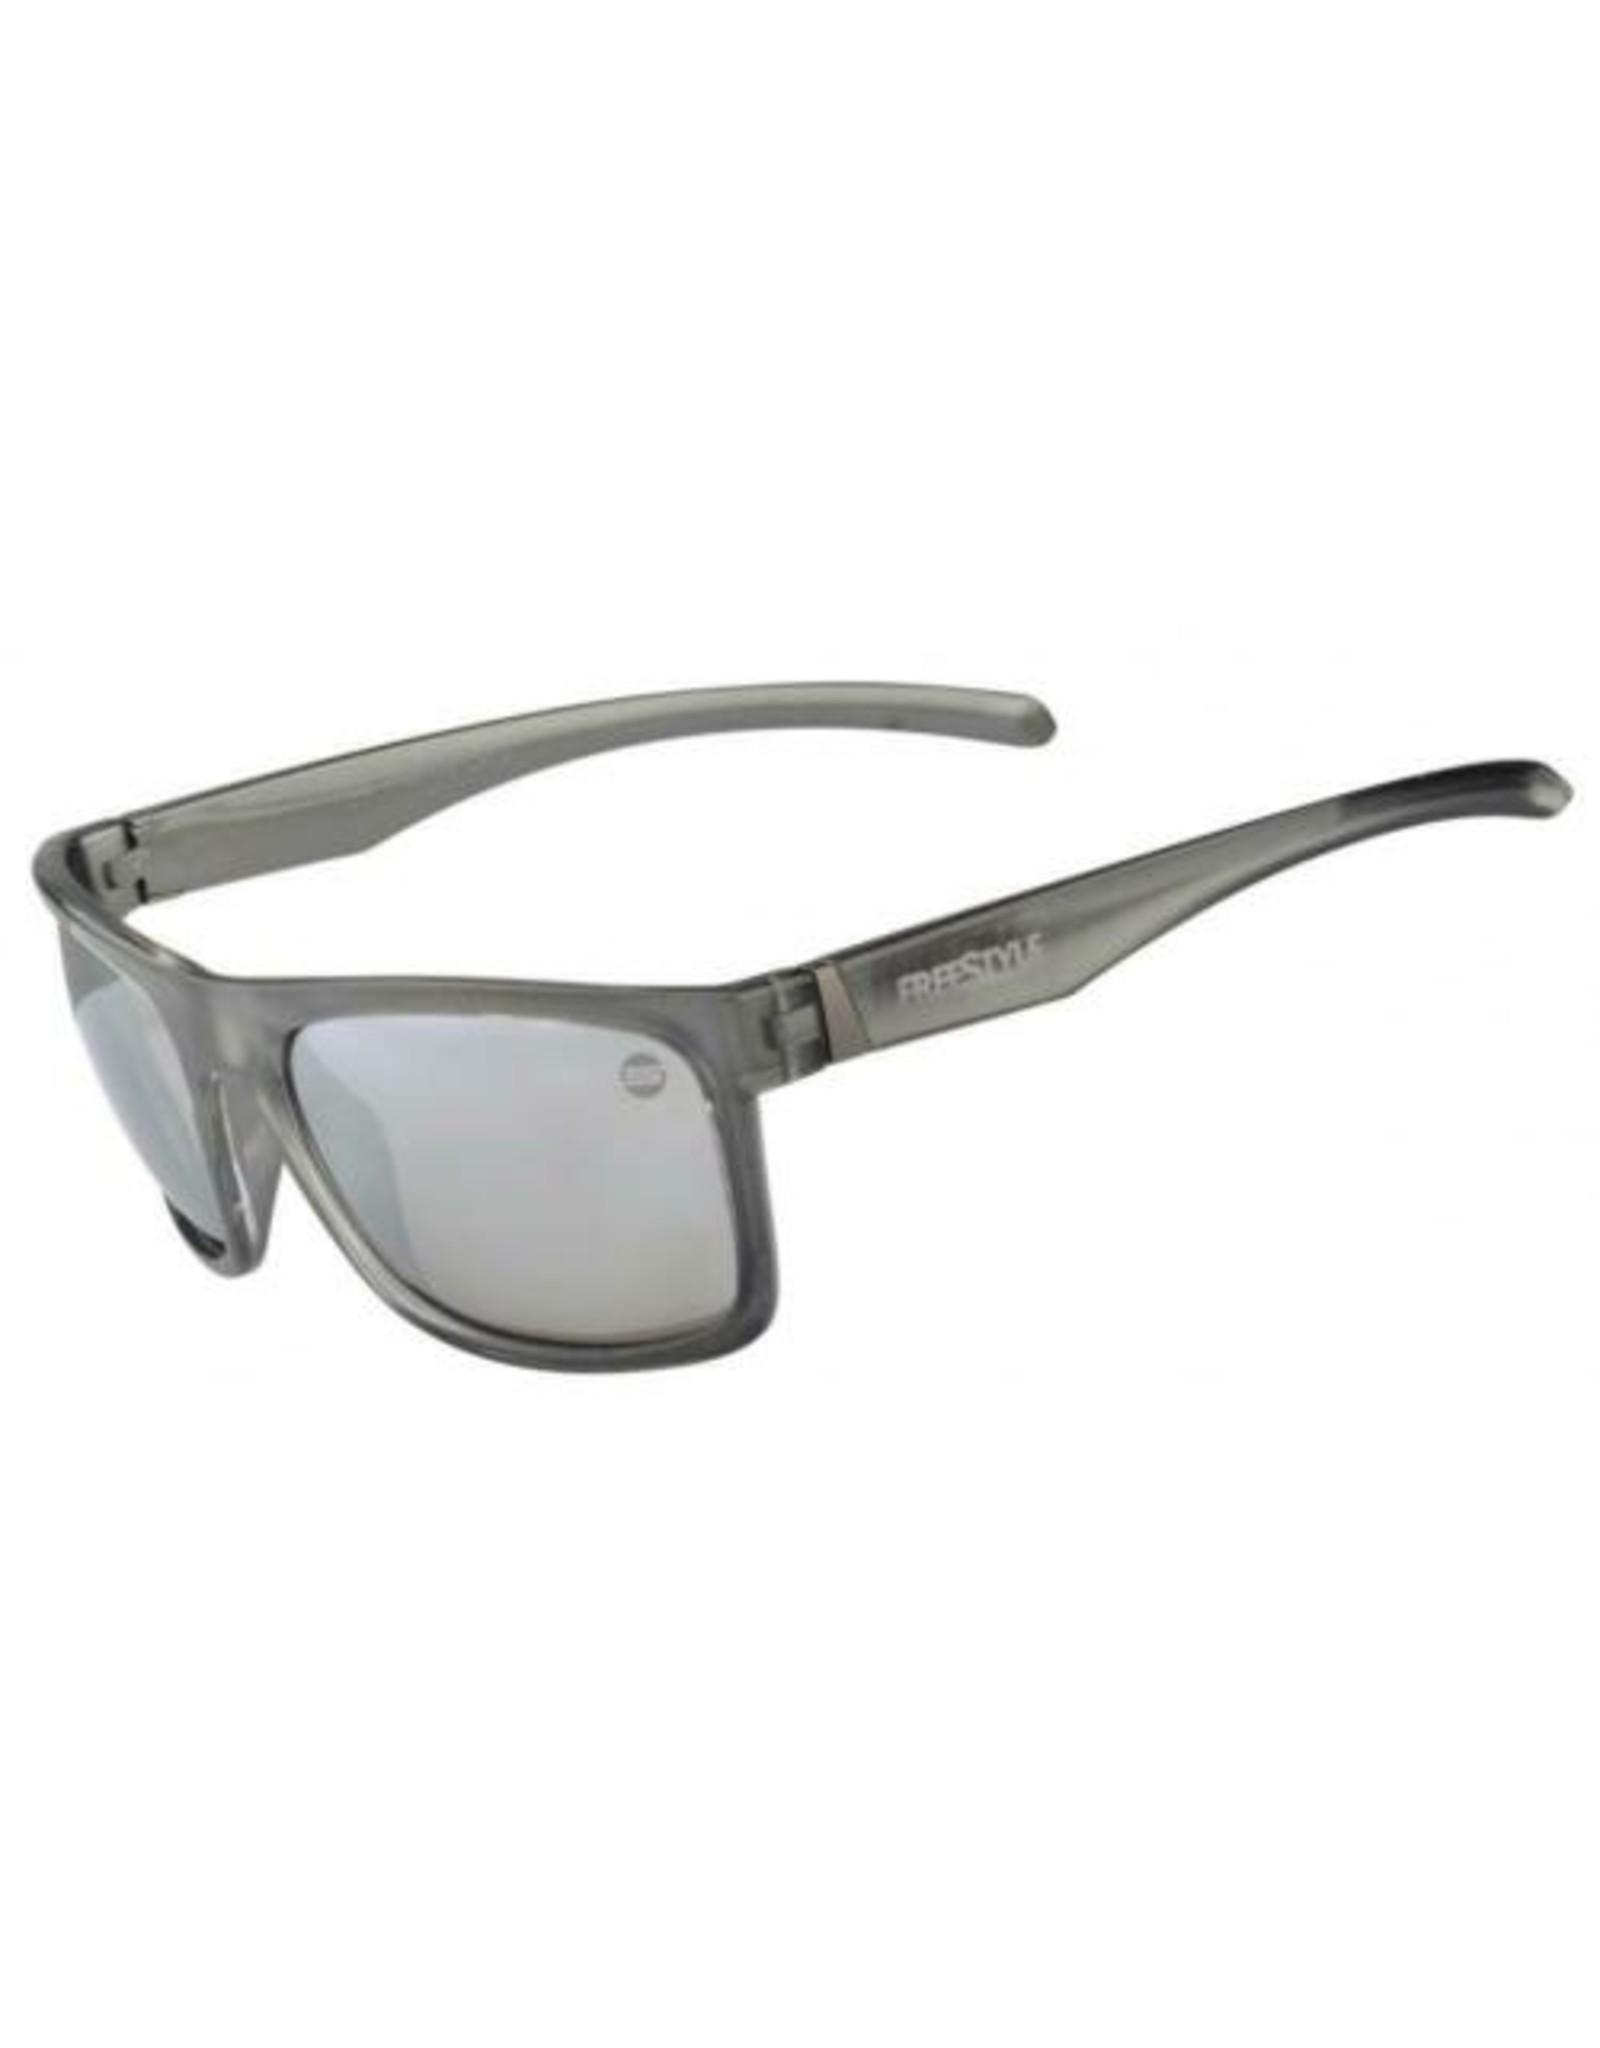 SPRO Spro Freestyle Sunglasses